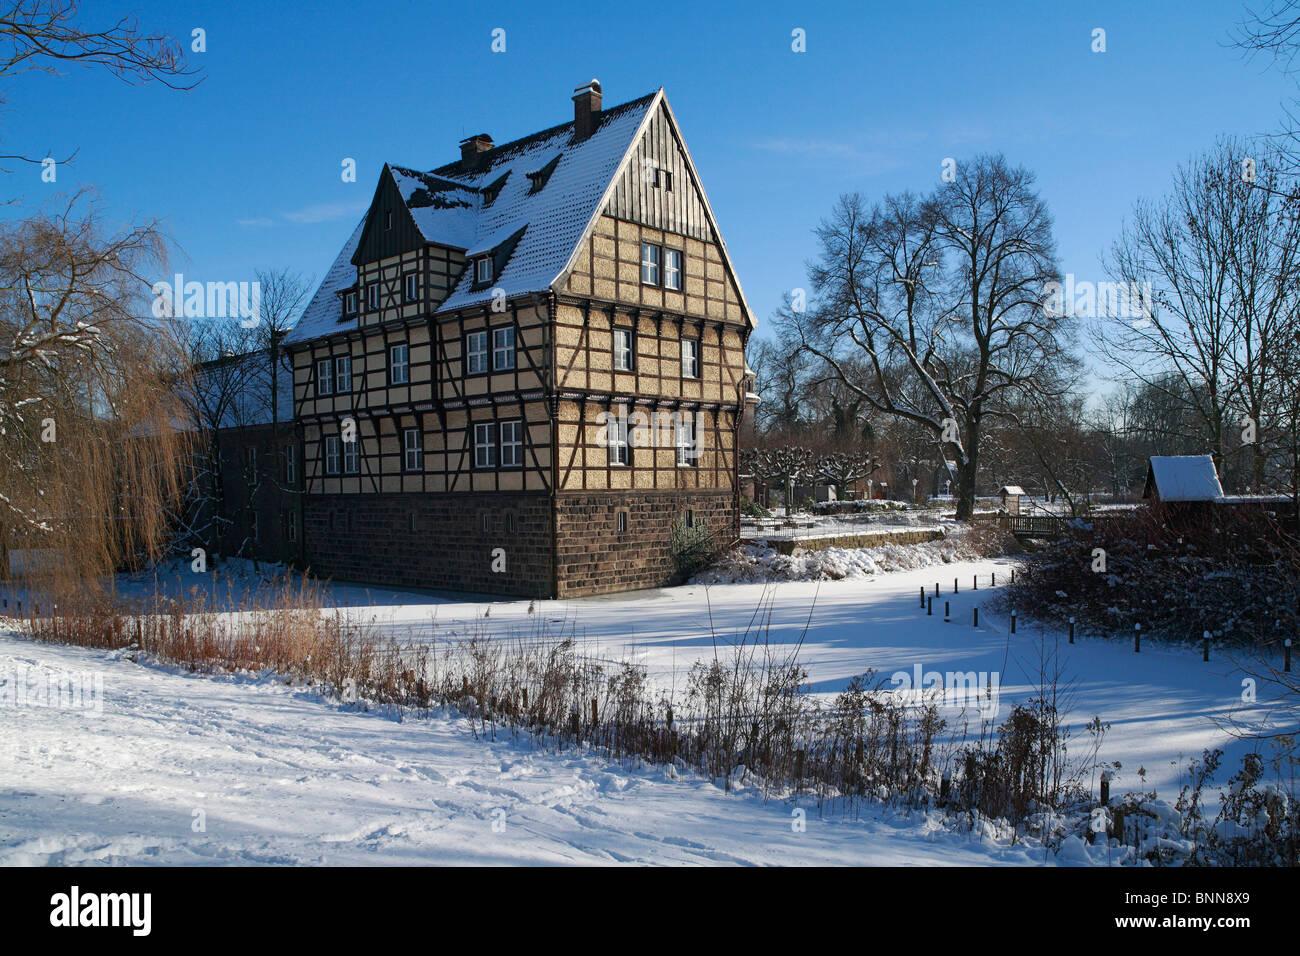 Gladbeck Stock Photos & Gladbeck Stock Images - Alamy